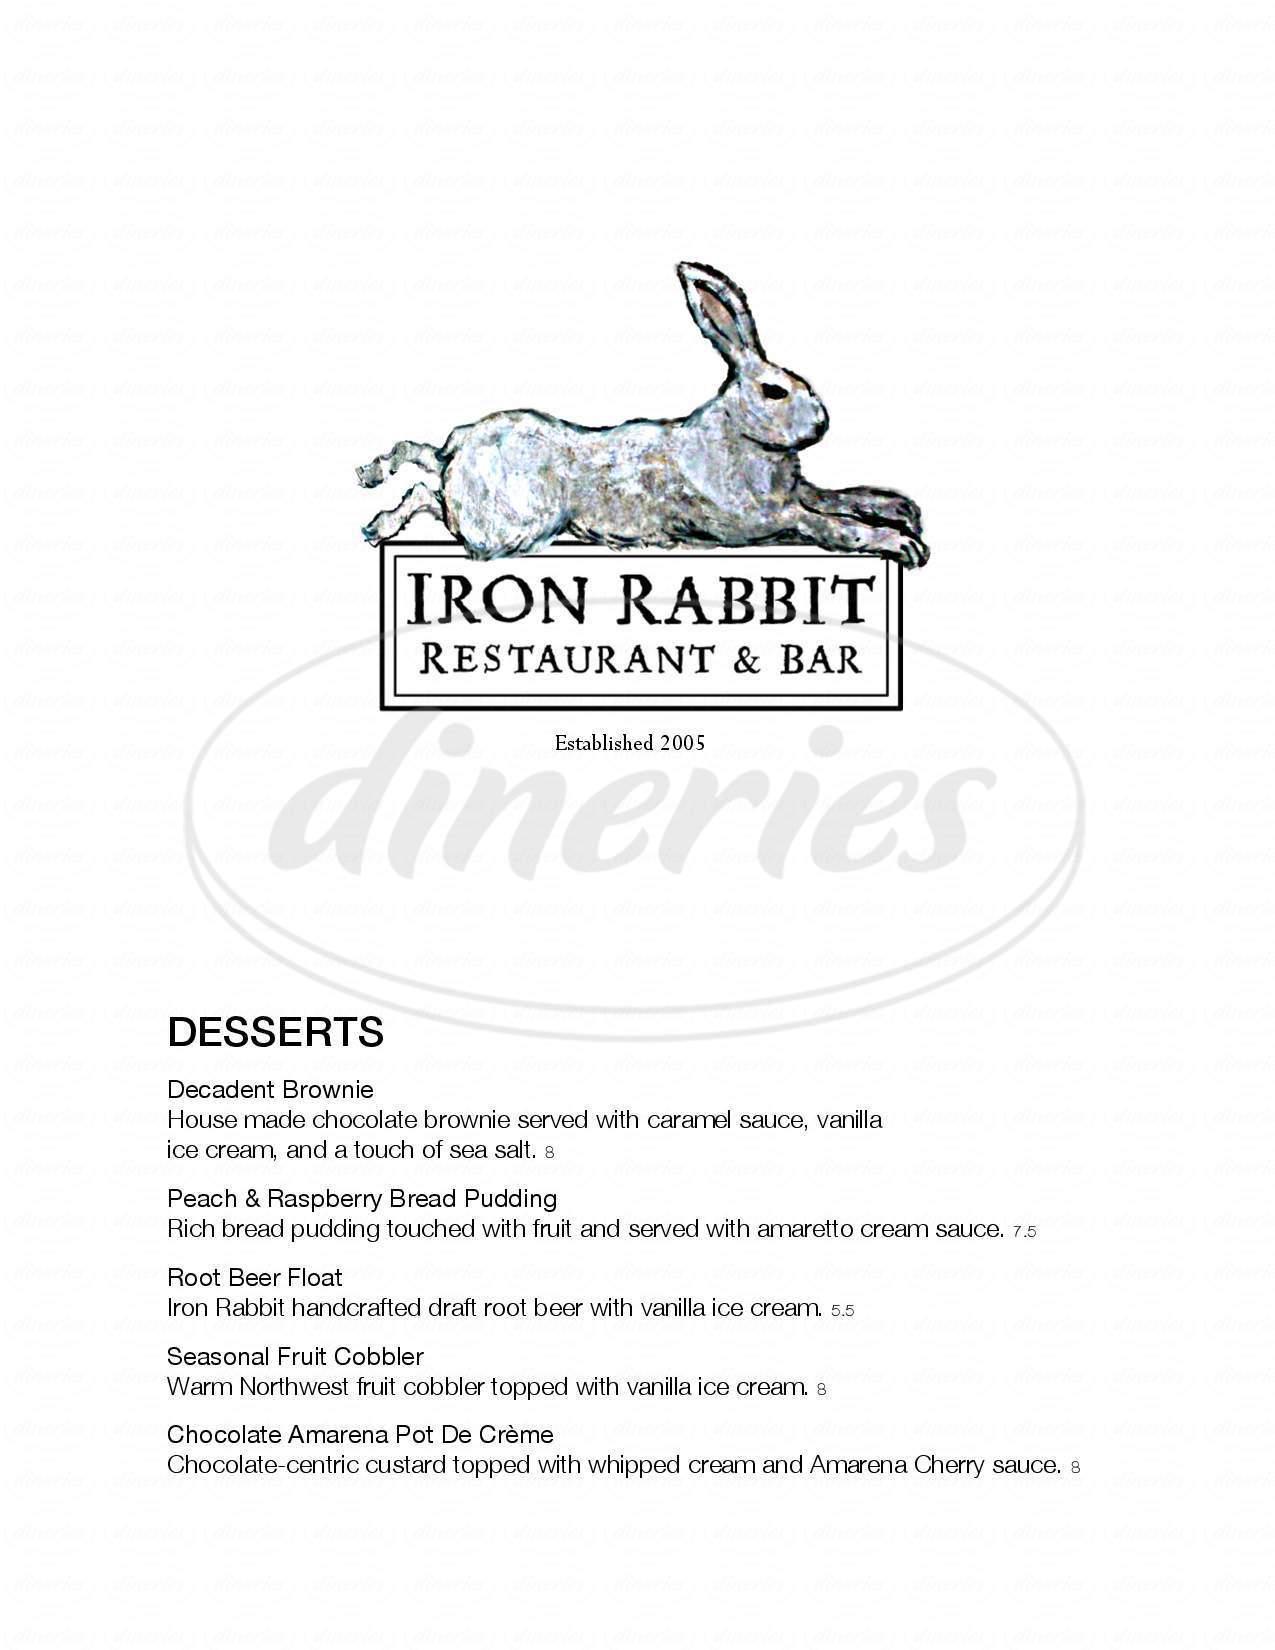 menu for Iron Rabbit Restaurant & Bar